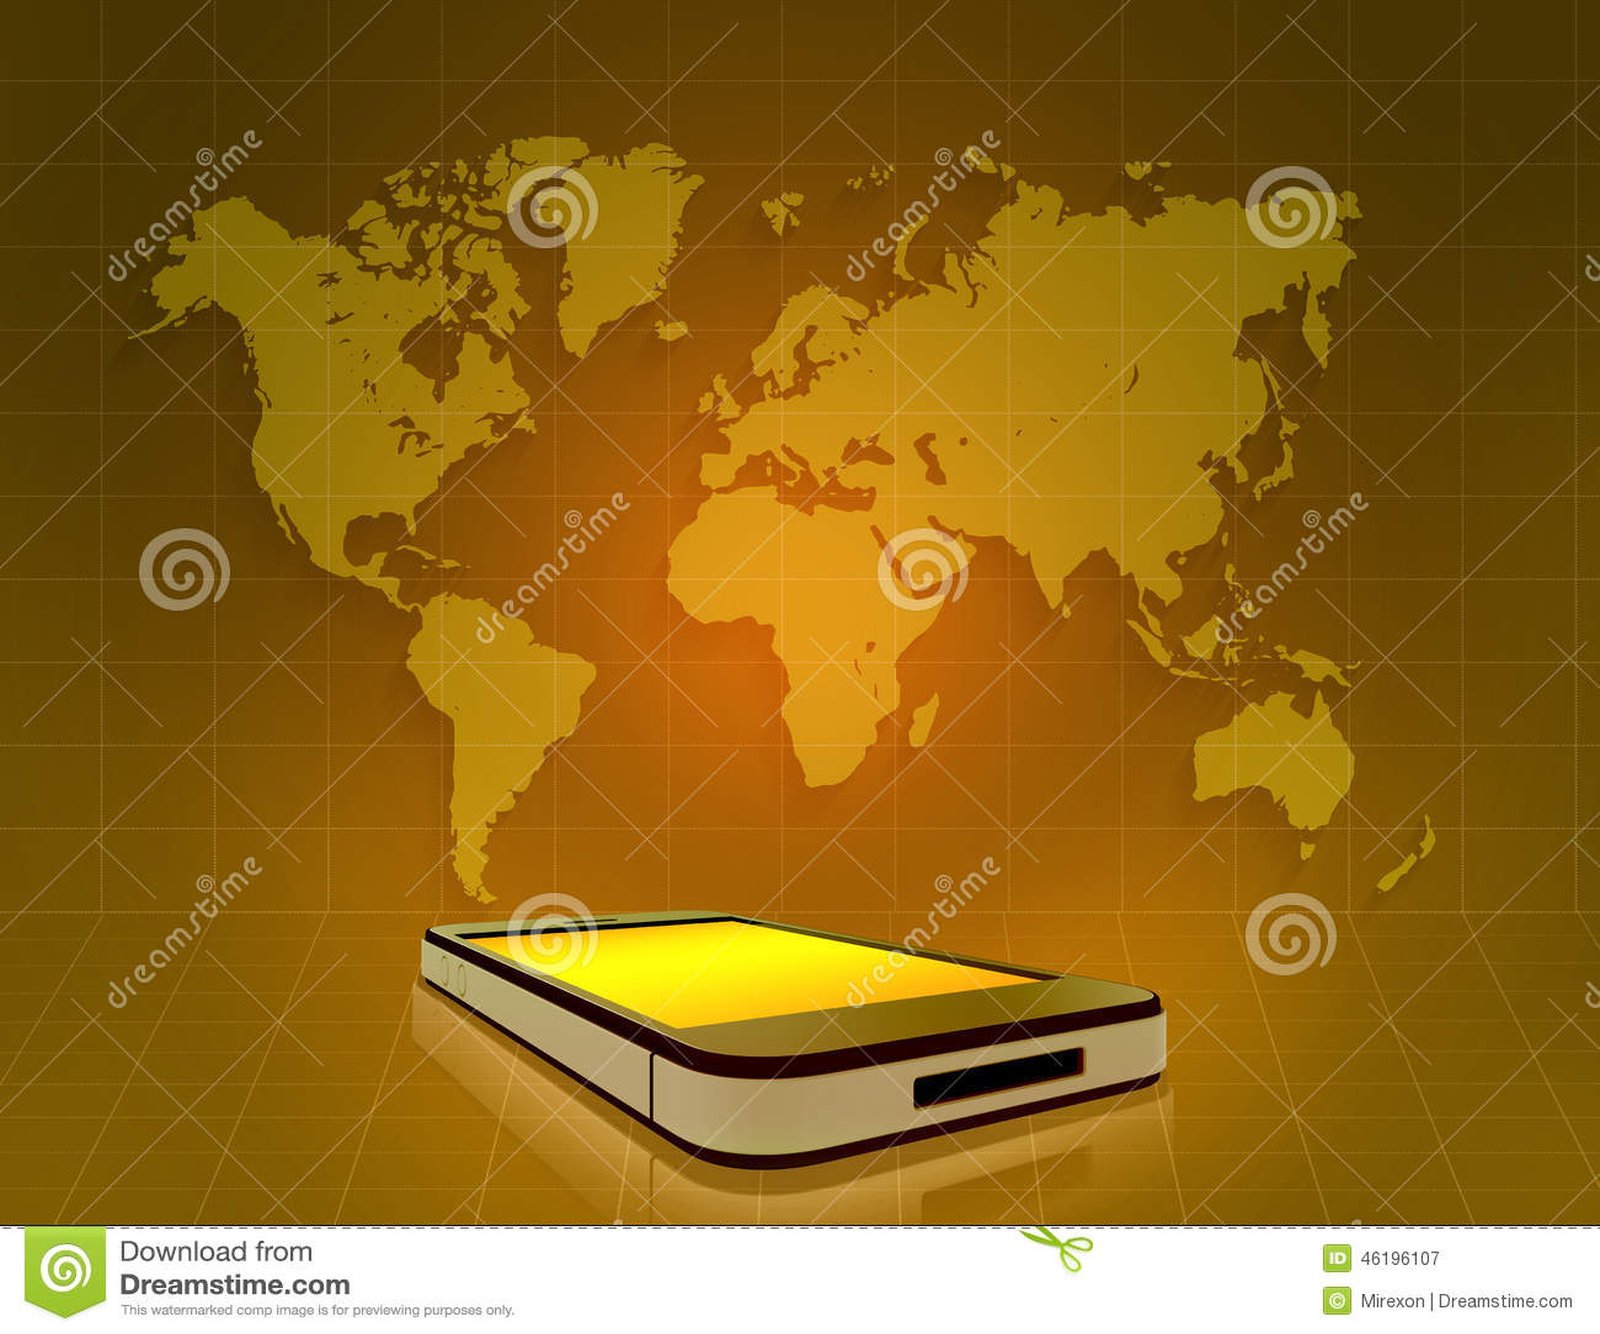 Mobile phone and world map on grid orange stock illustration mobile phone and world map on grid orange royalty free illustration download publicscrutiny Choice Image